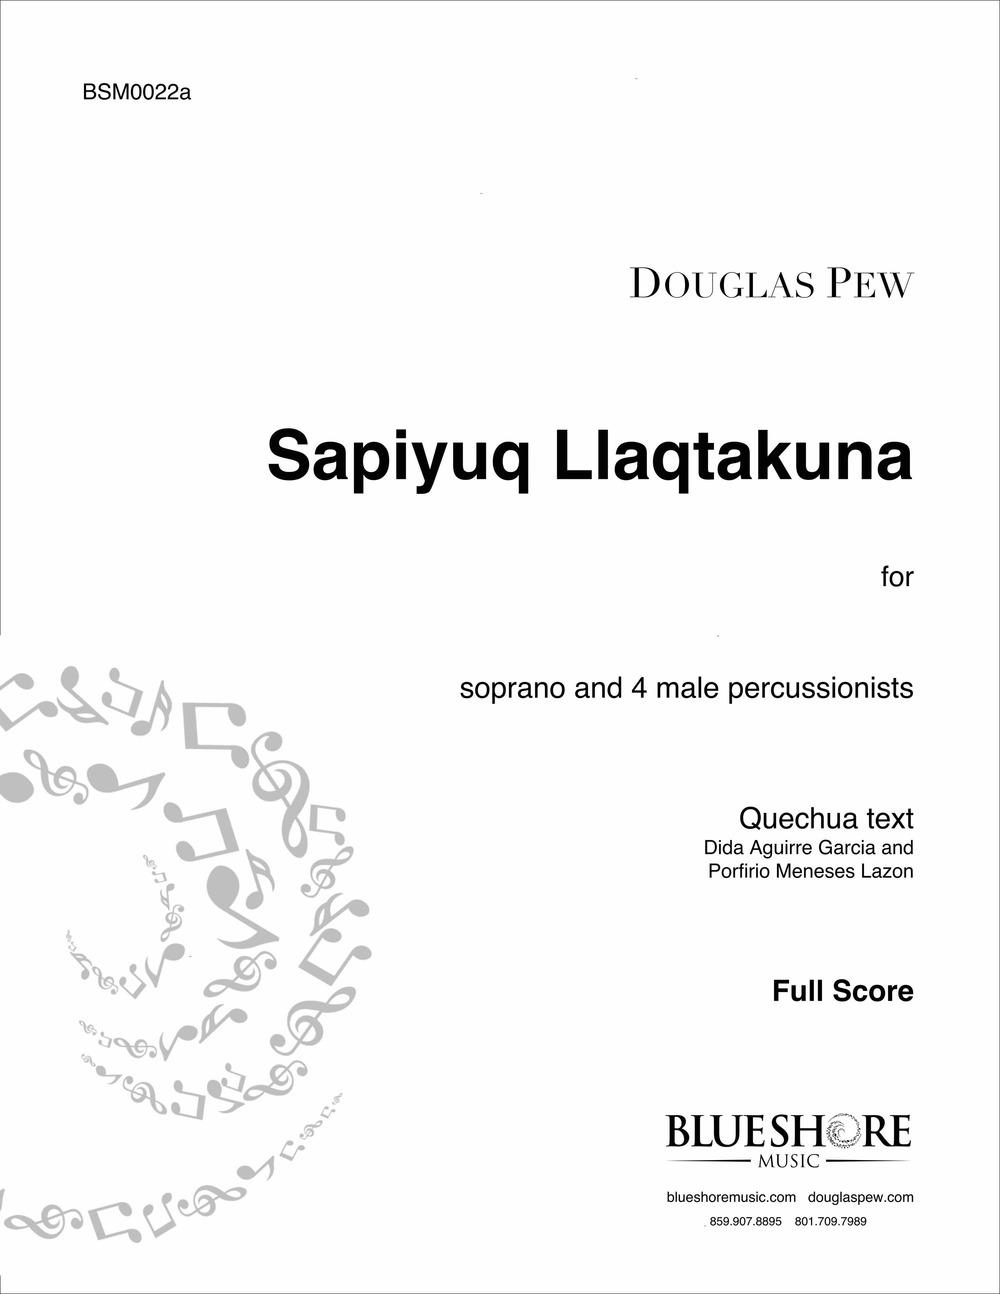 Sapiyuq Llaqtakuna,for Soprano and 4 Male Percussionists